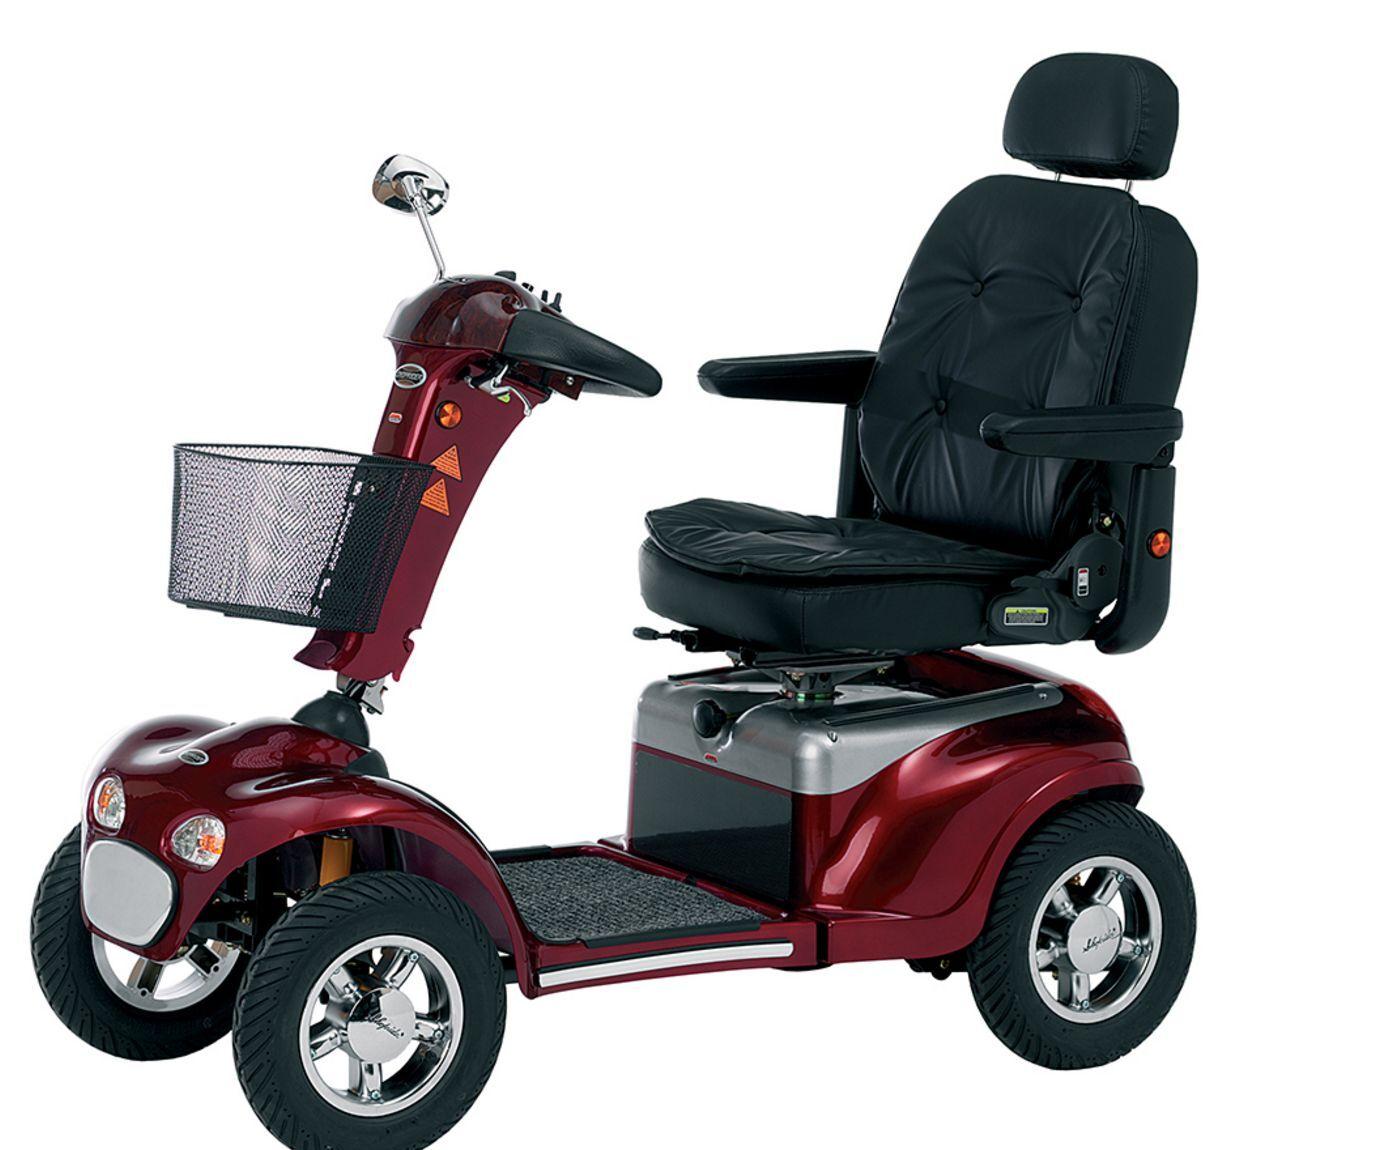 brand new shoprider cordoba 8mph heavy duty road legal